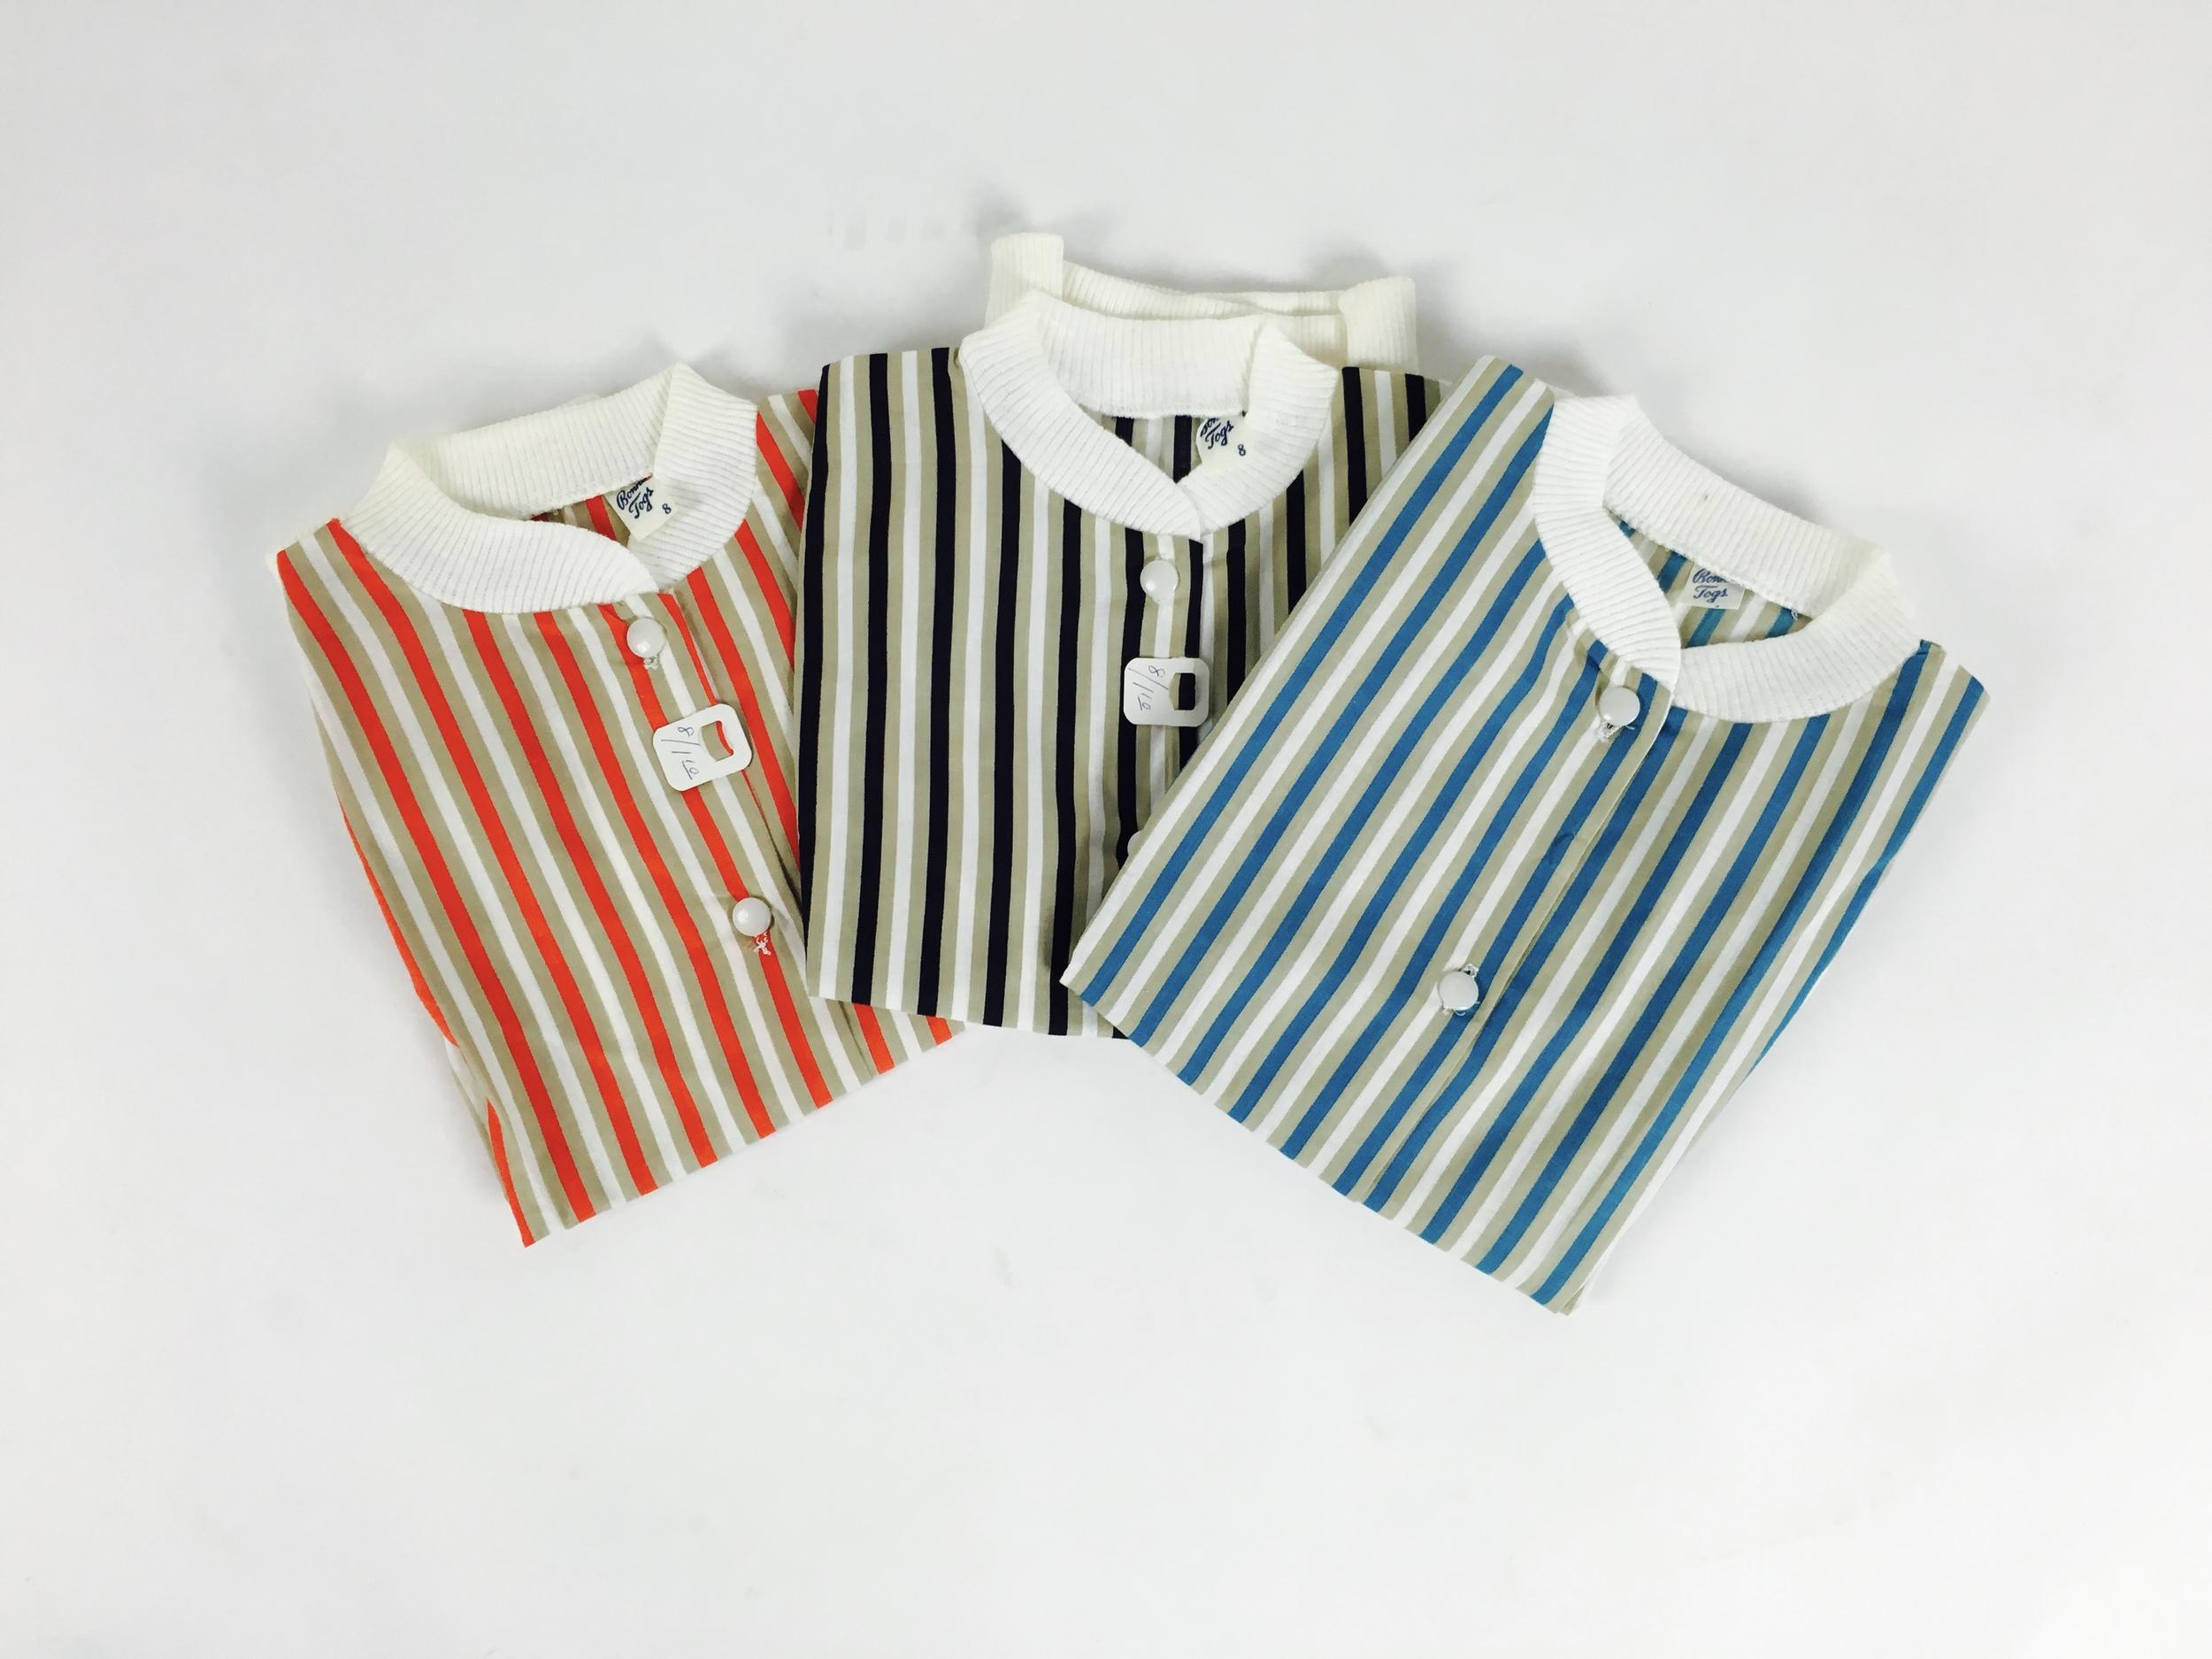 Vintage 1950's deadstock girls' shirts